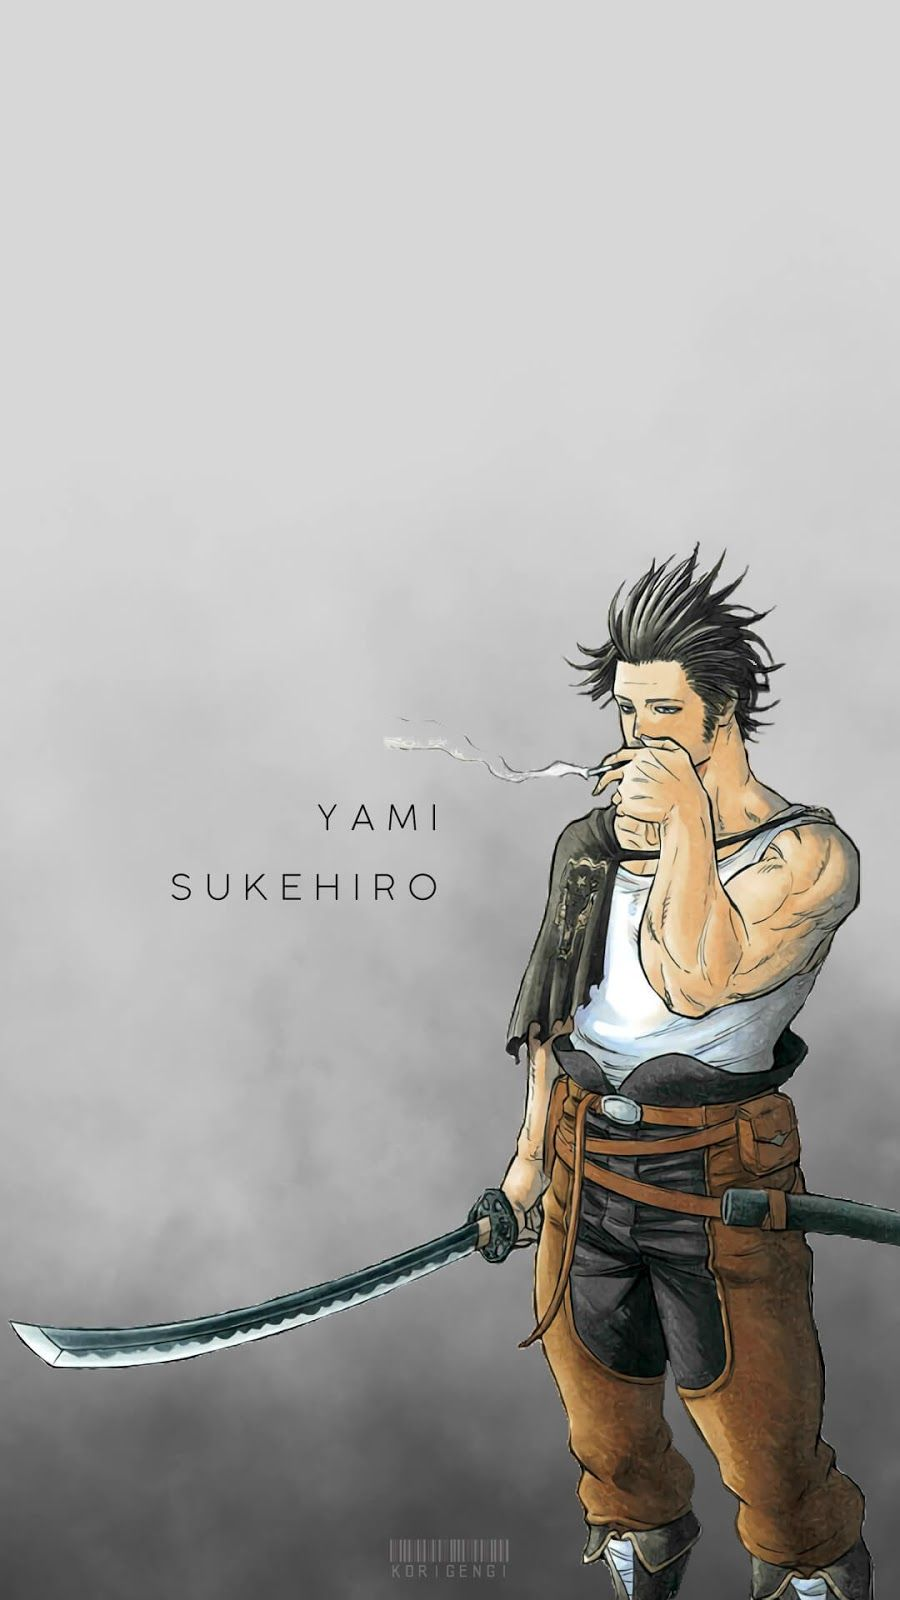 Yami Sukehiro Black Clover Wallpaper Korigengi Anime Wallpaper Hd Source Gambar Anime Cara Menggambar Seni Anime